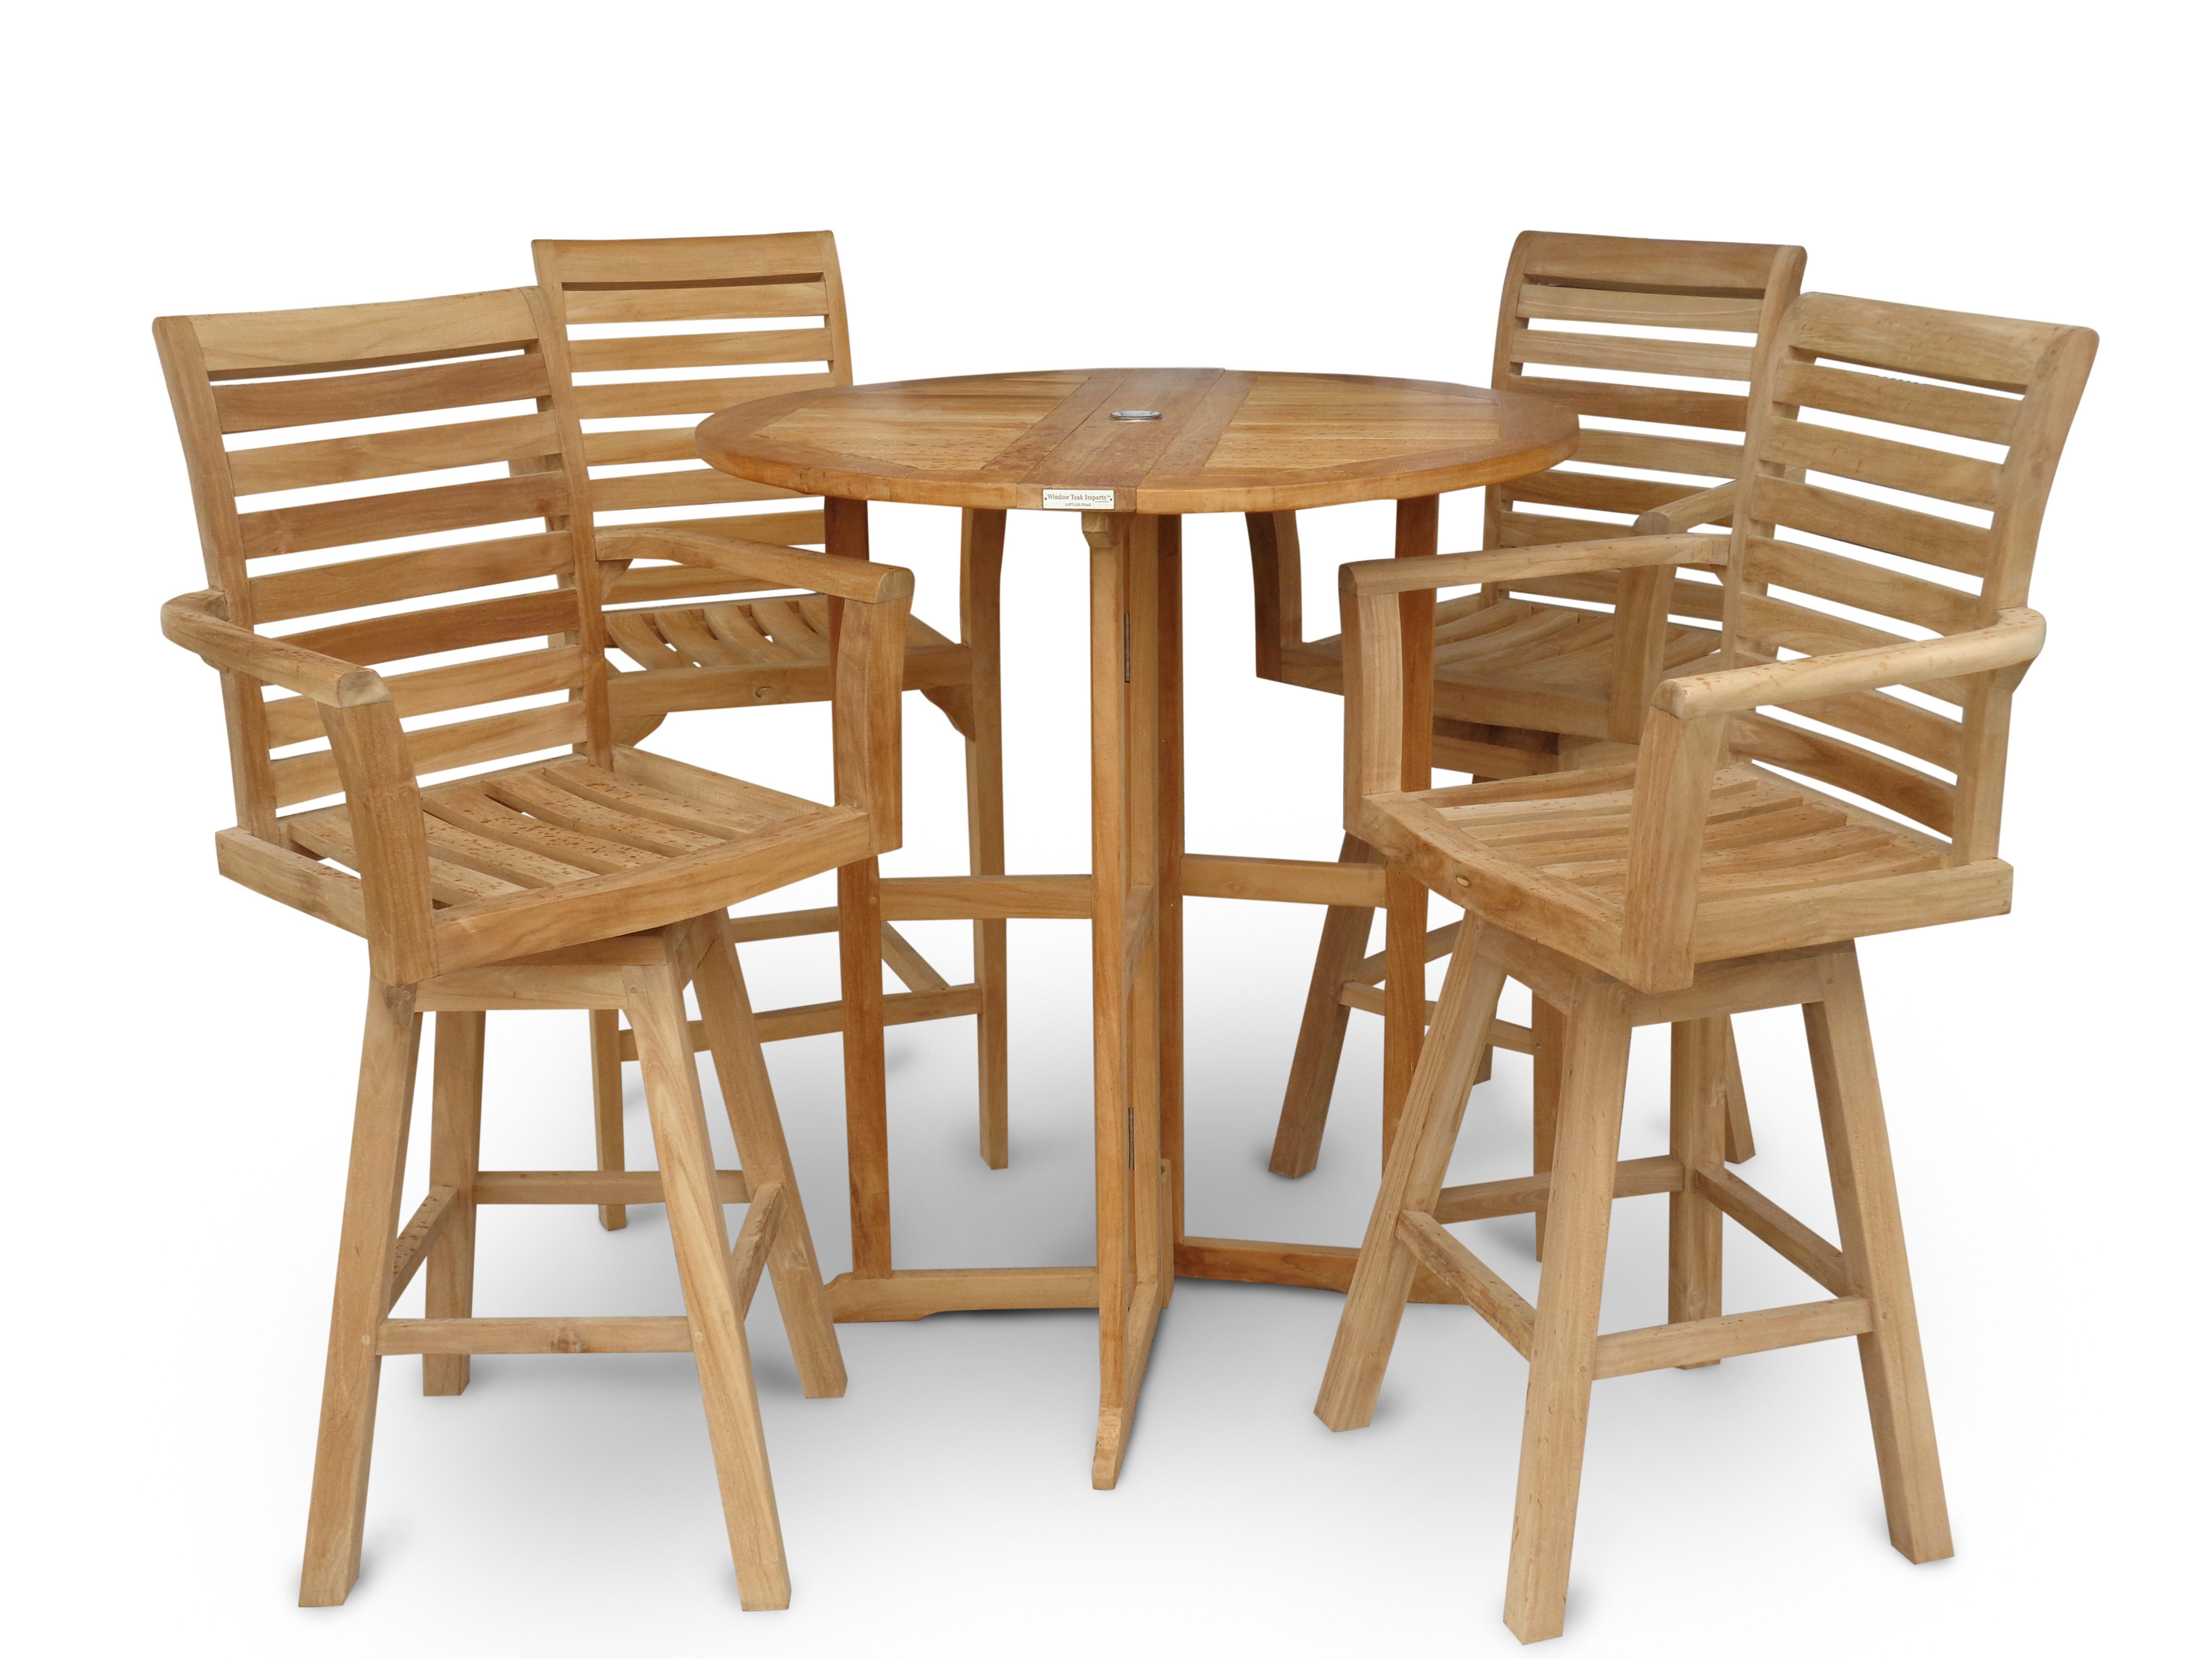 Nassau 39 Round Teak Drop Leaf Folding Bar Table w 4 St. Moritz Swivel Bar Chairs